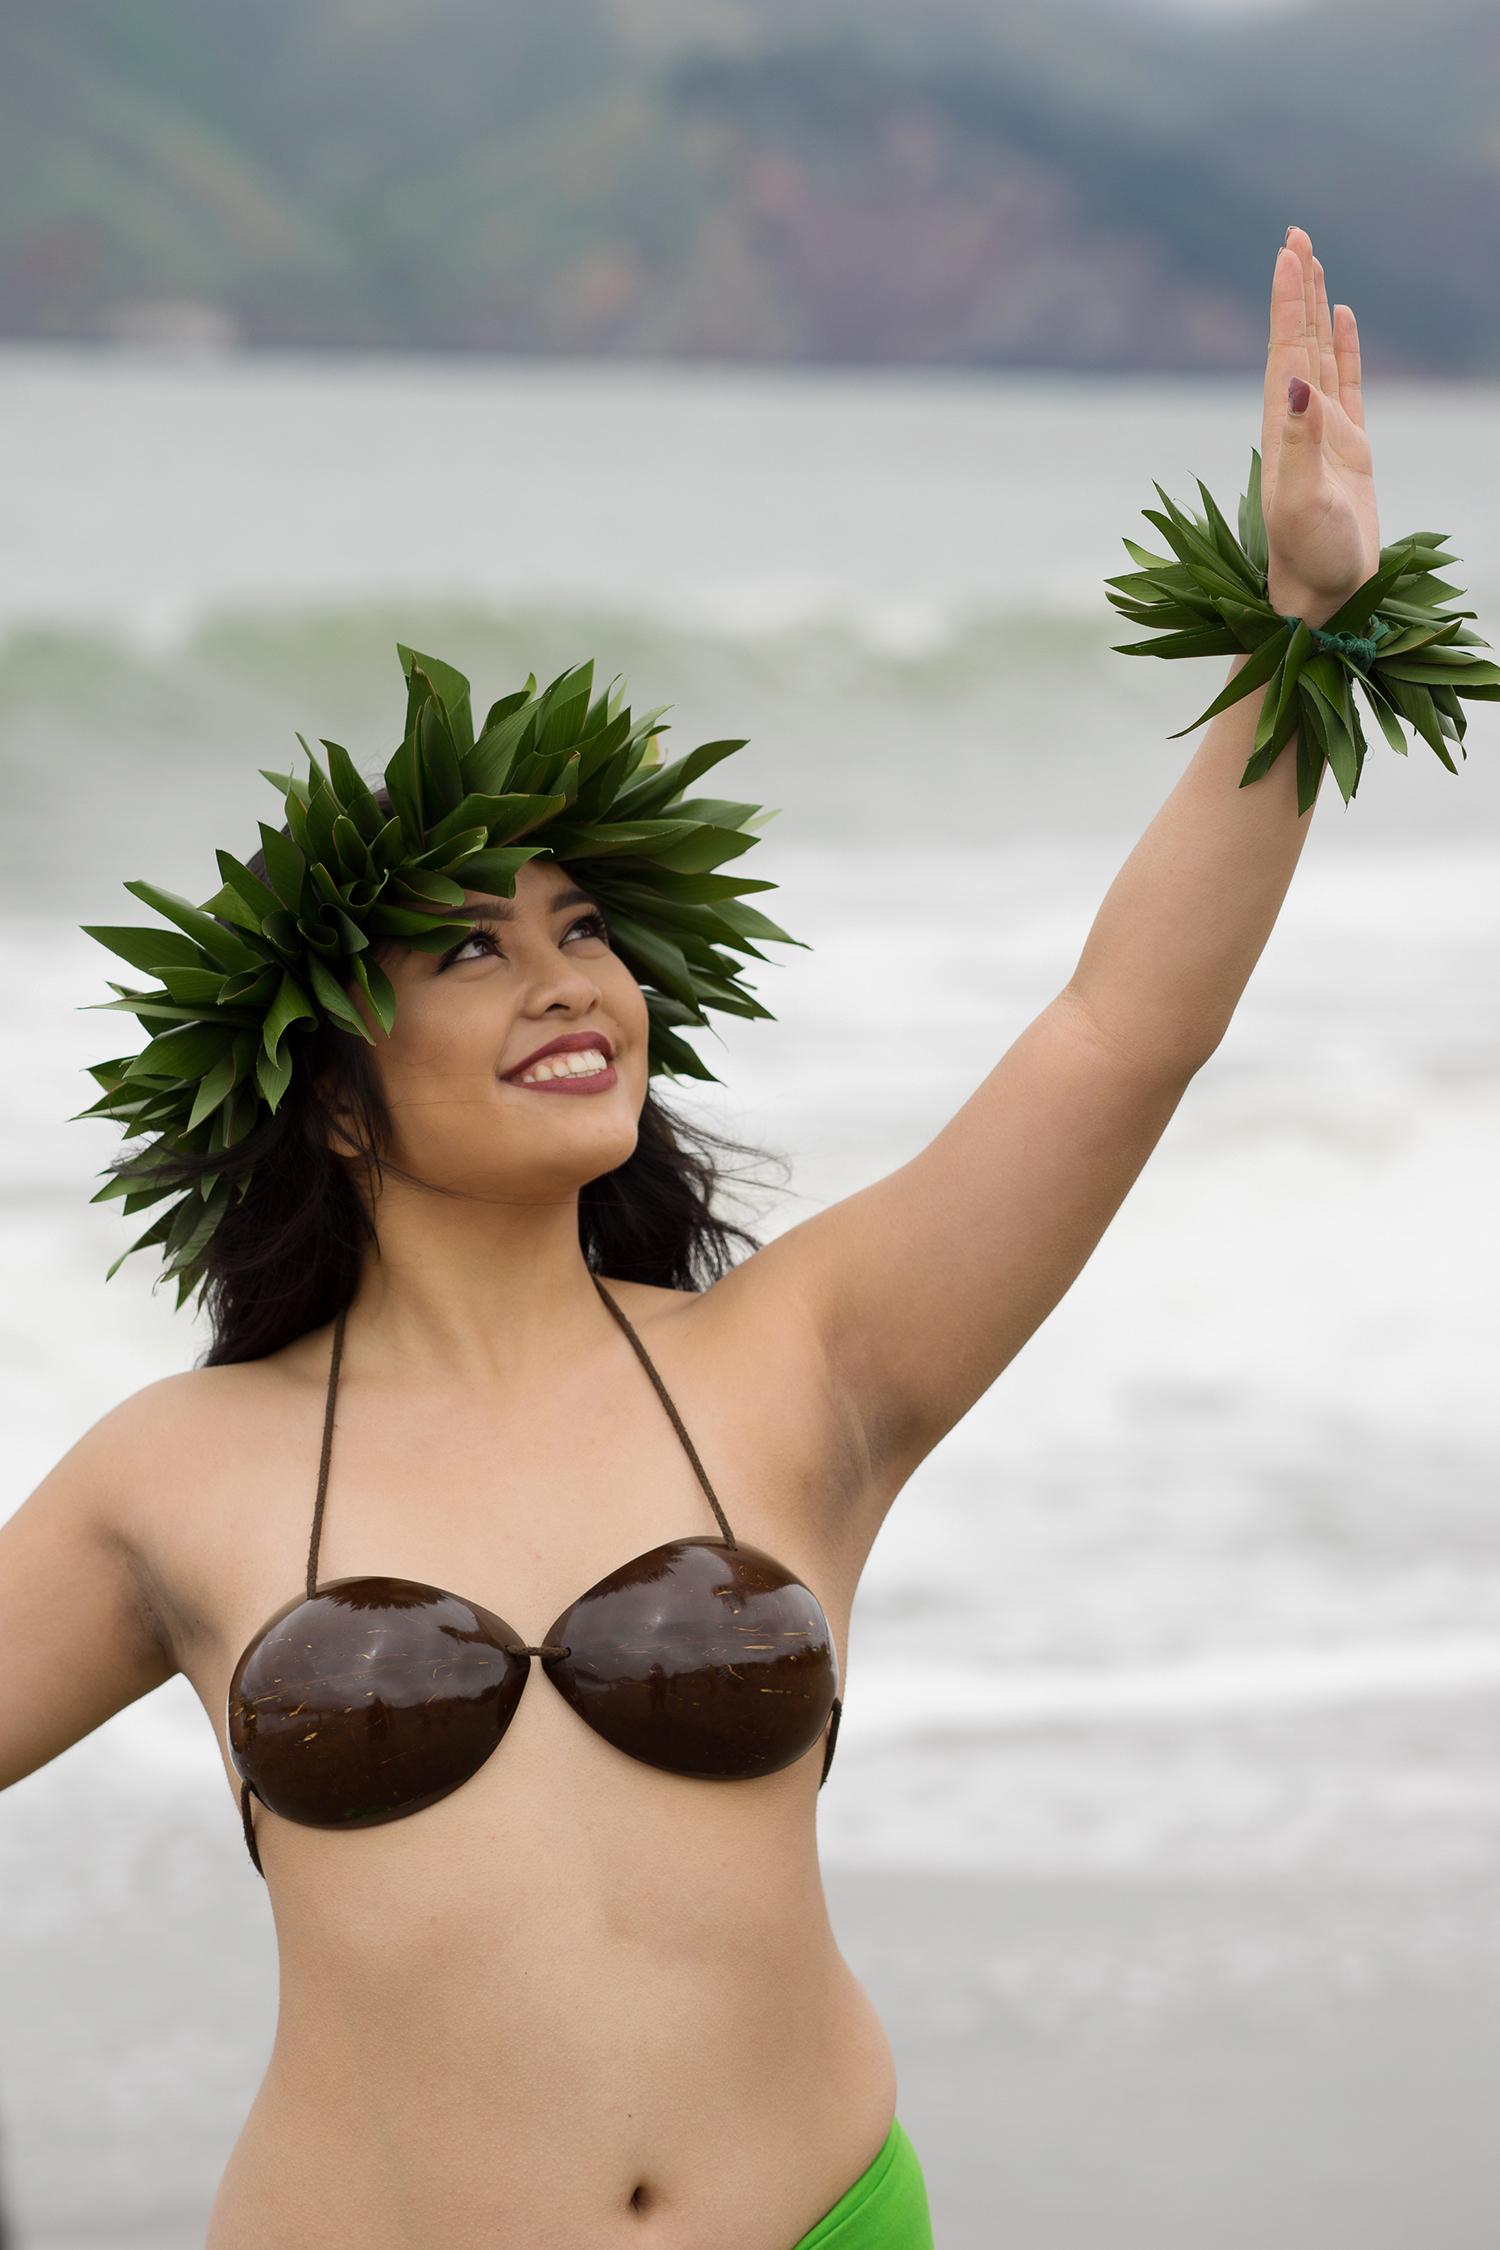 Manuia-Polynesian-Revue-Portrait-Luxchromatic-Photography-Hula-Dance-San-Francisco-Bay-Area-Sony-Alpha-A7Rii-Zeiss-Lens-Profoto-B1-B2-Wescott-Aloha-SonyAlpha-1125.jpg